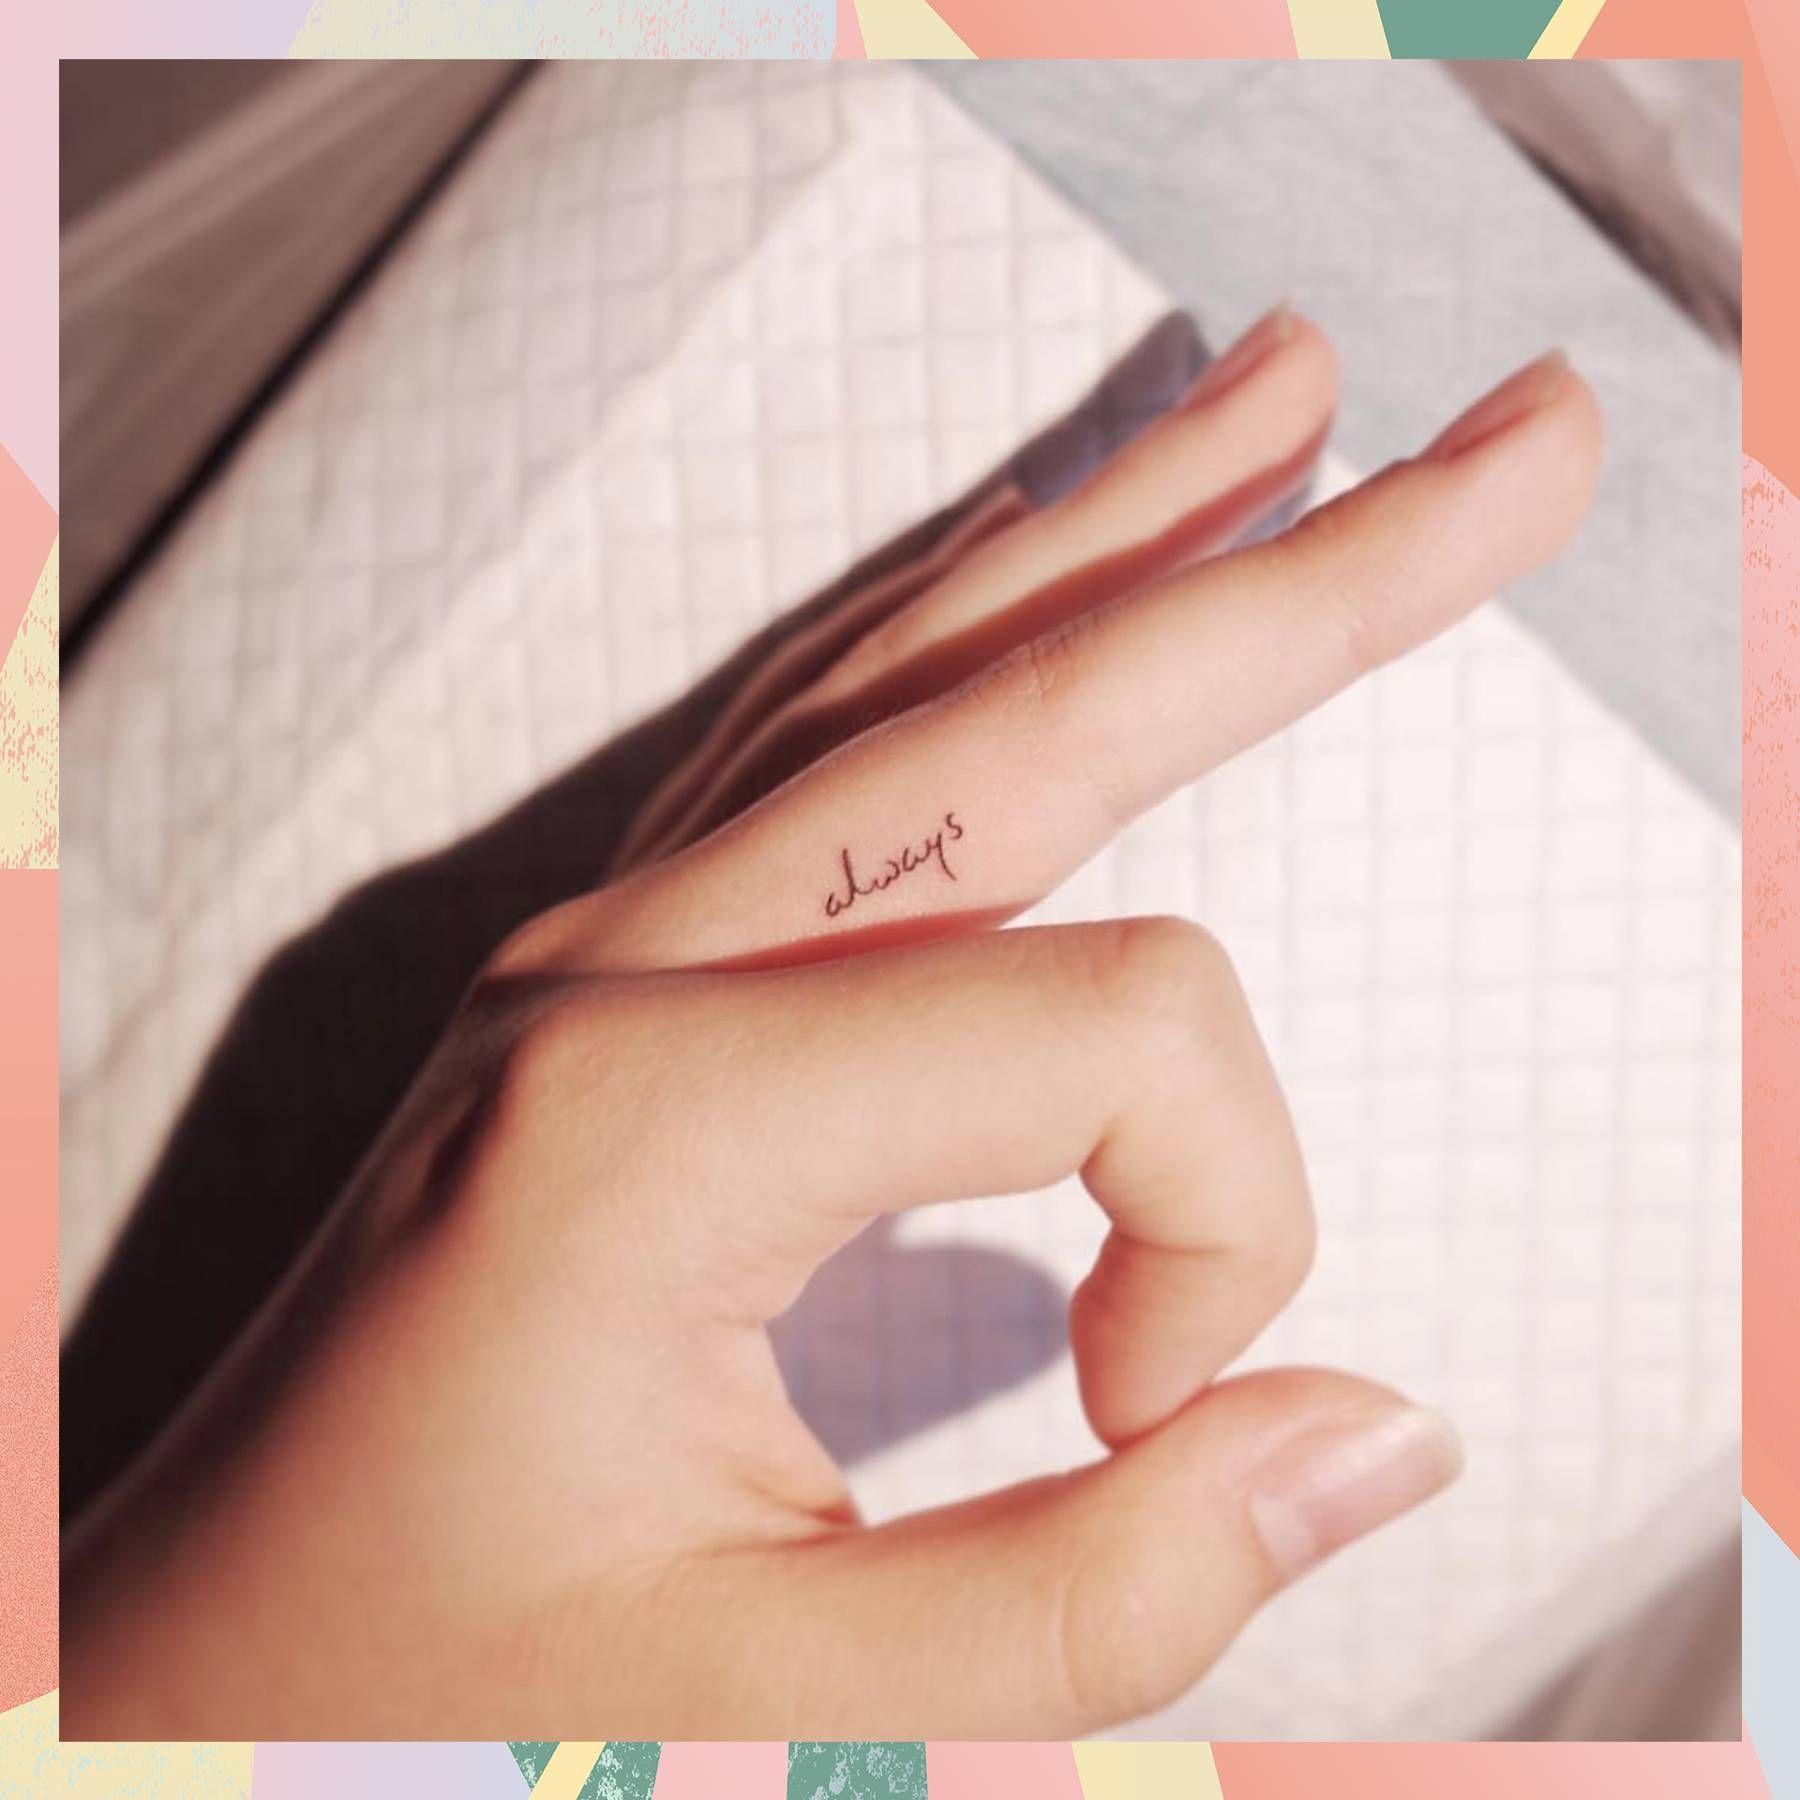 cute-small-finger-tattoos-woman-fucks-boys-download